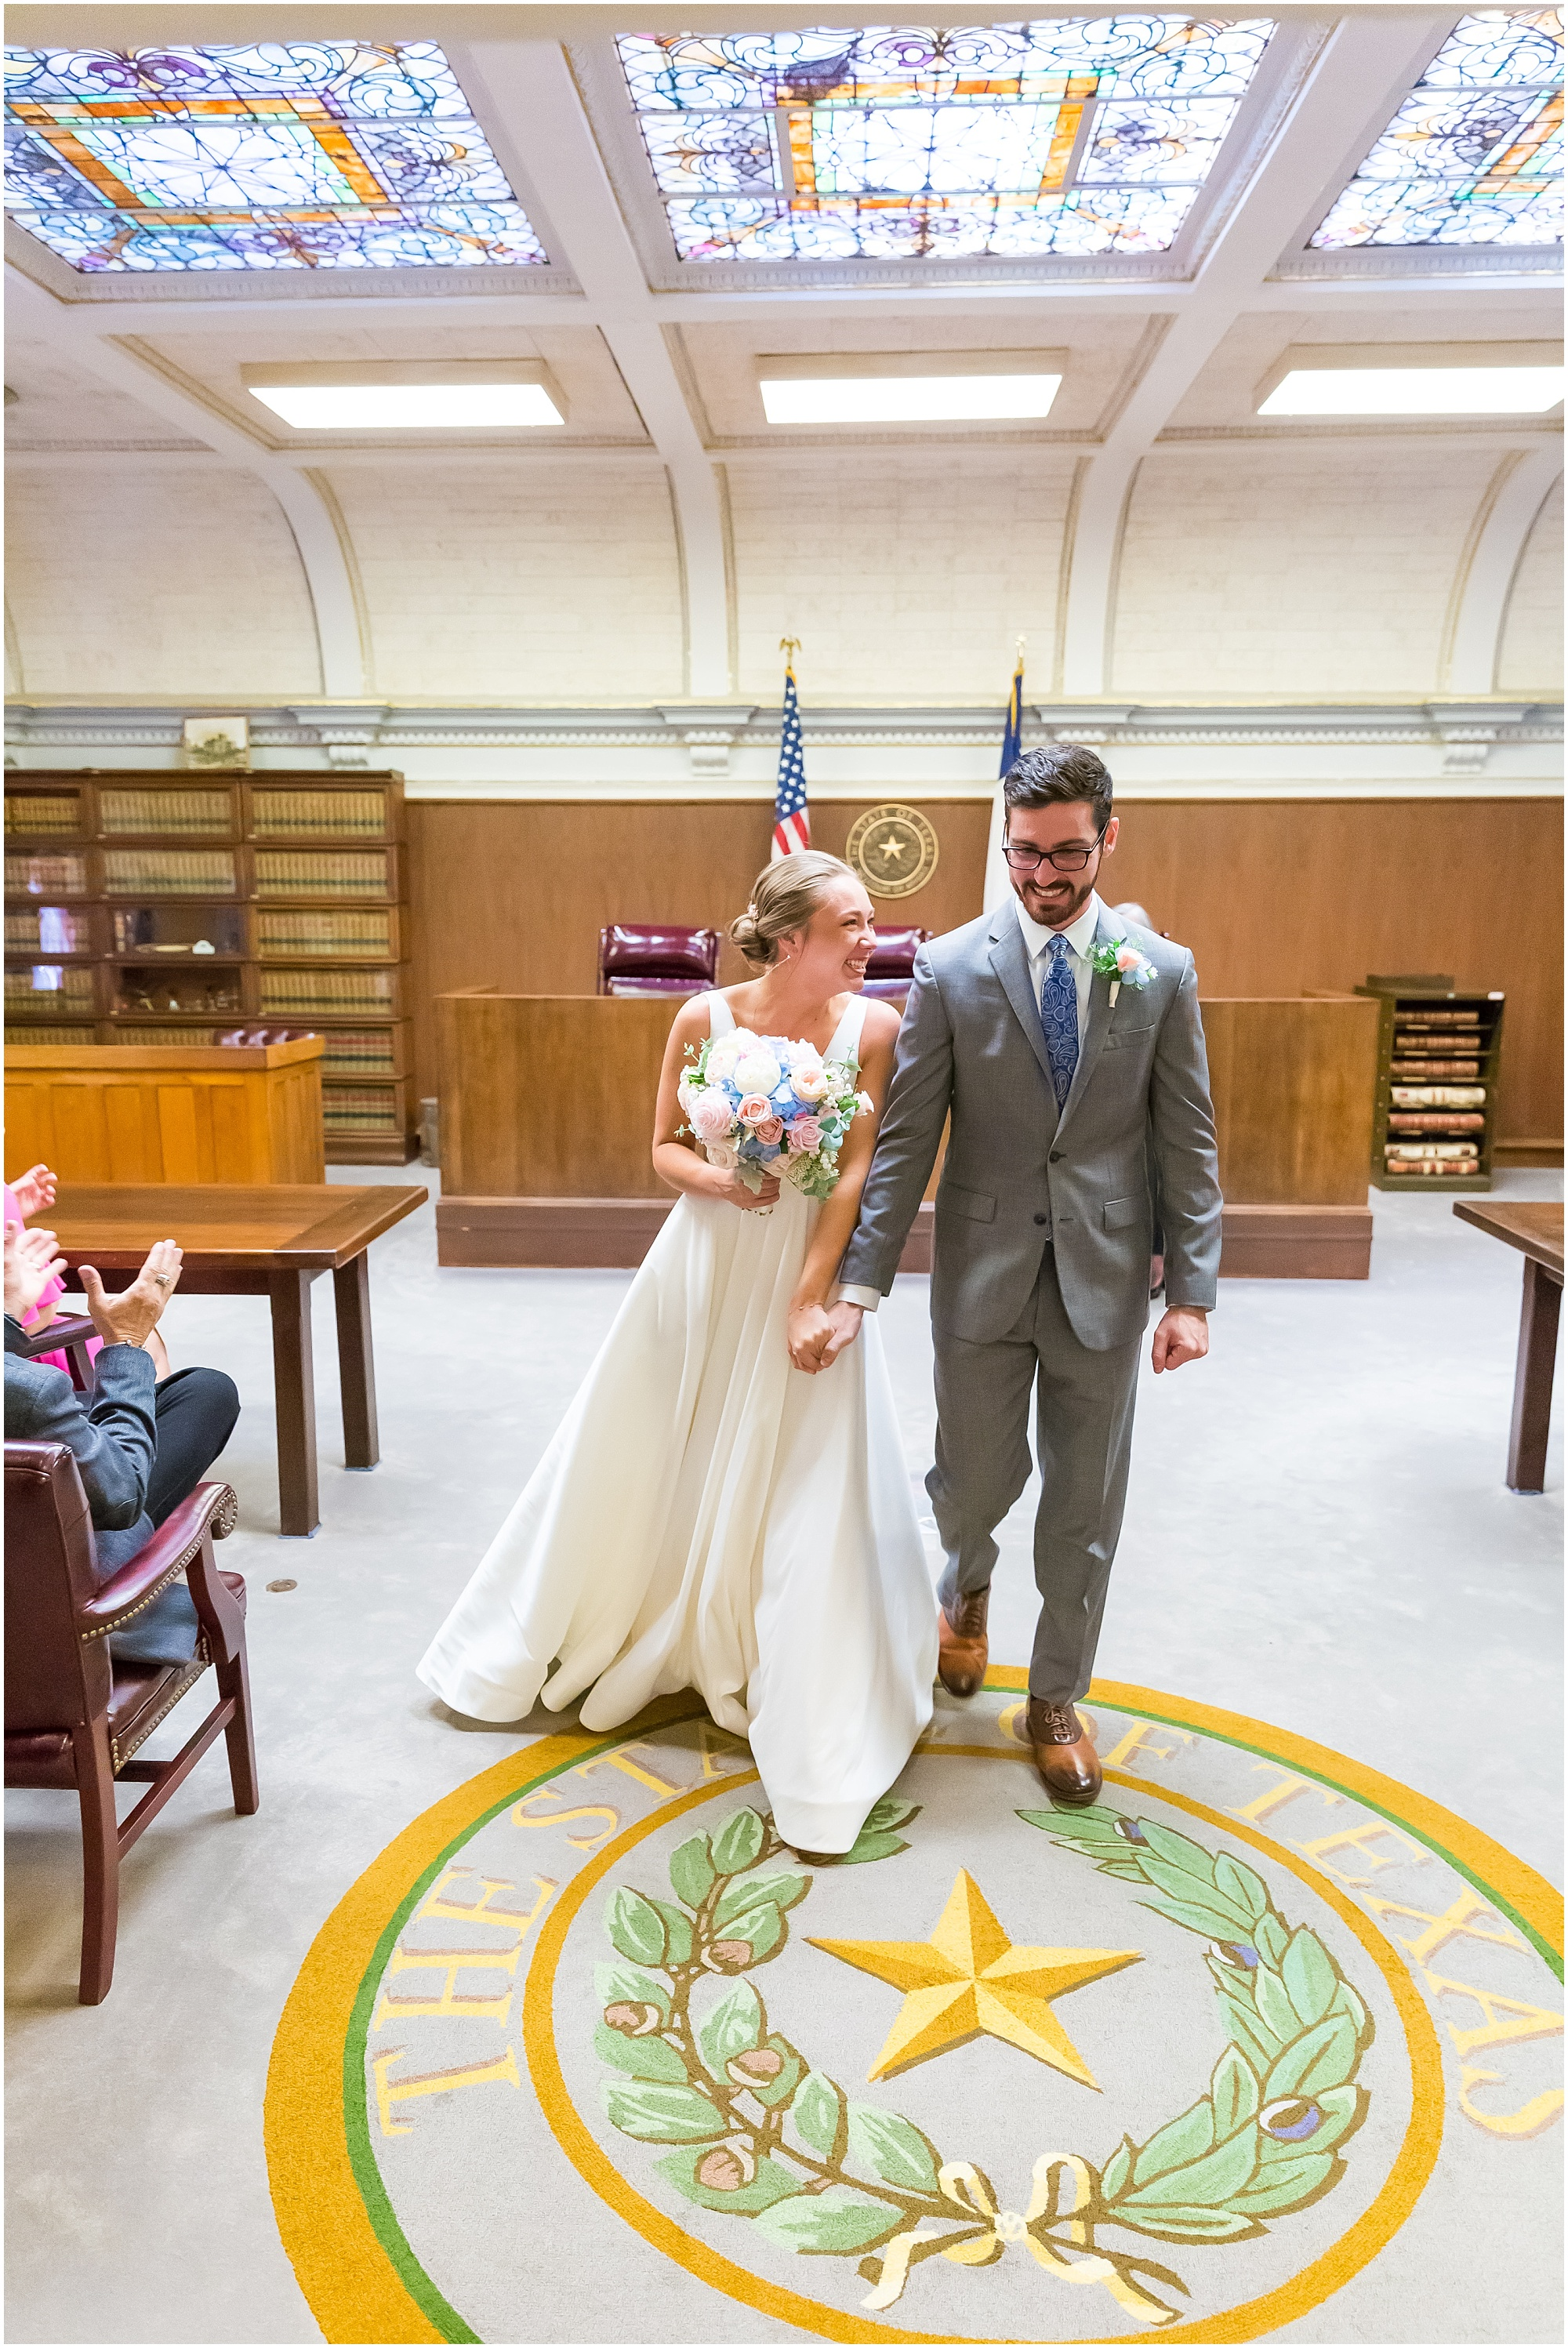 Courthouse-Wedding-Waco-Texas_0017.jpg